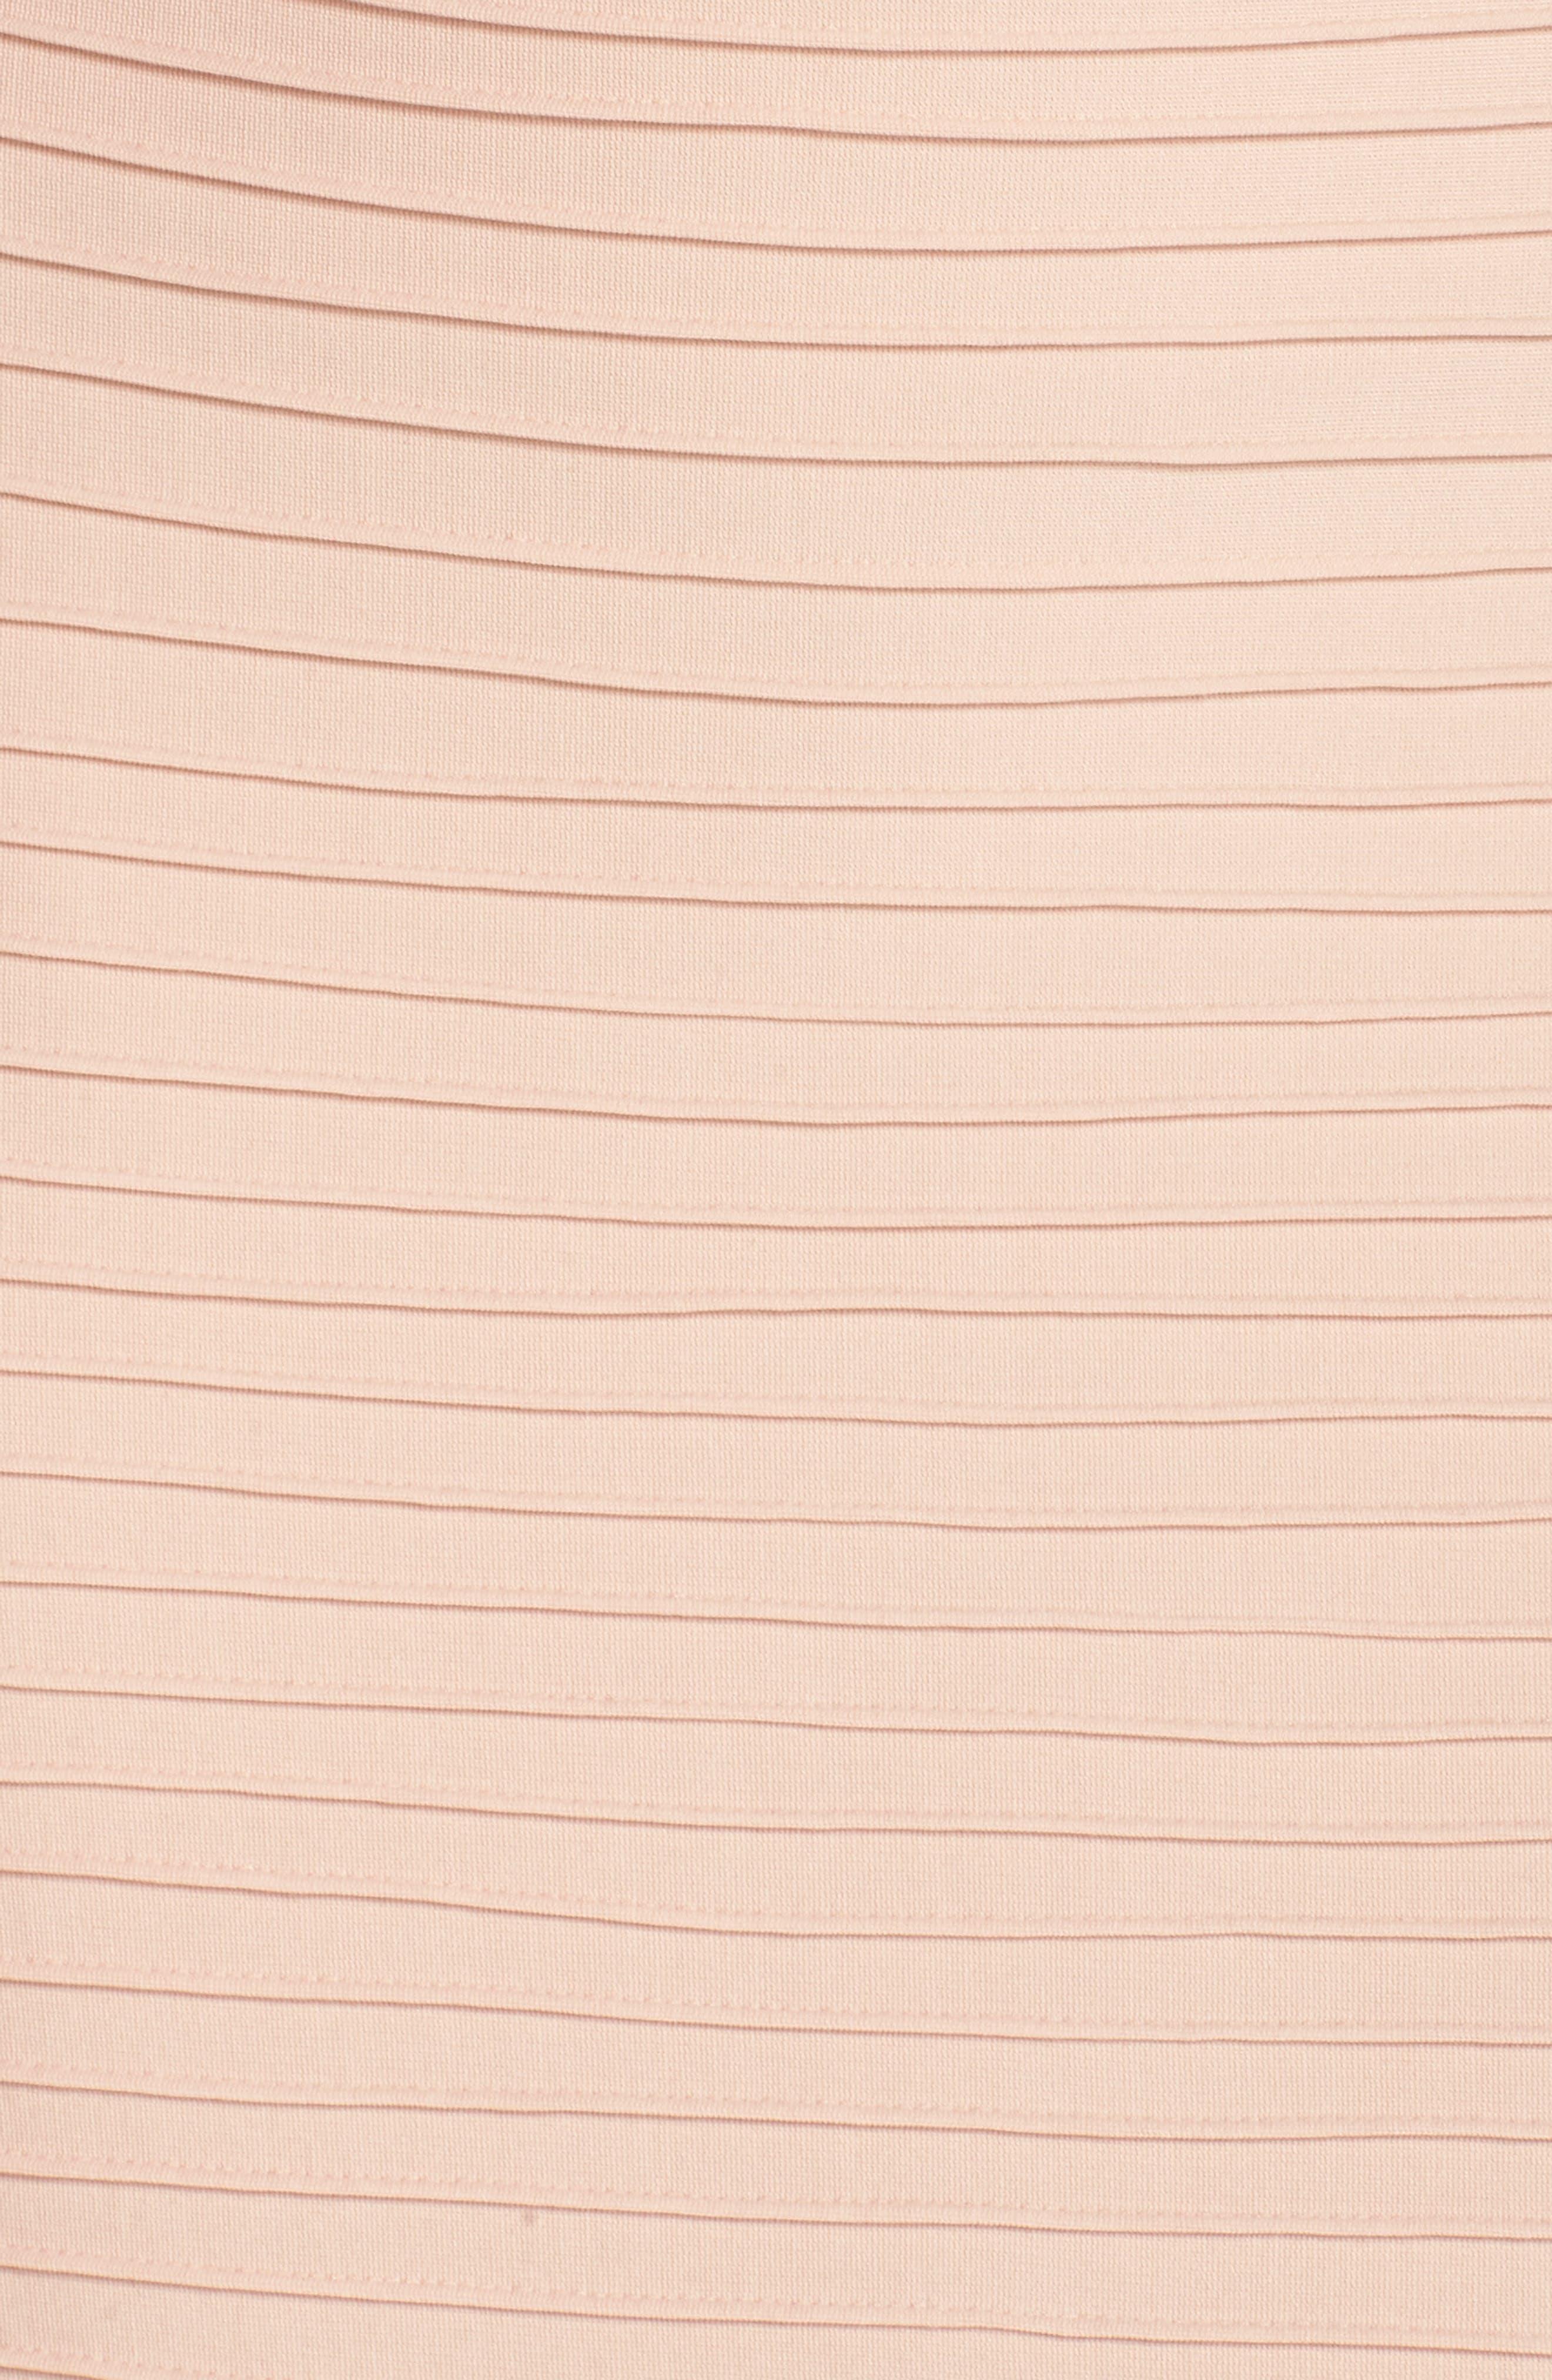 Mesh Inset Pintuck Dress,                             Alternate thumbnail 5, color,                             PETAL/ BLOOM